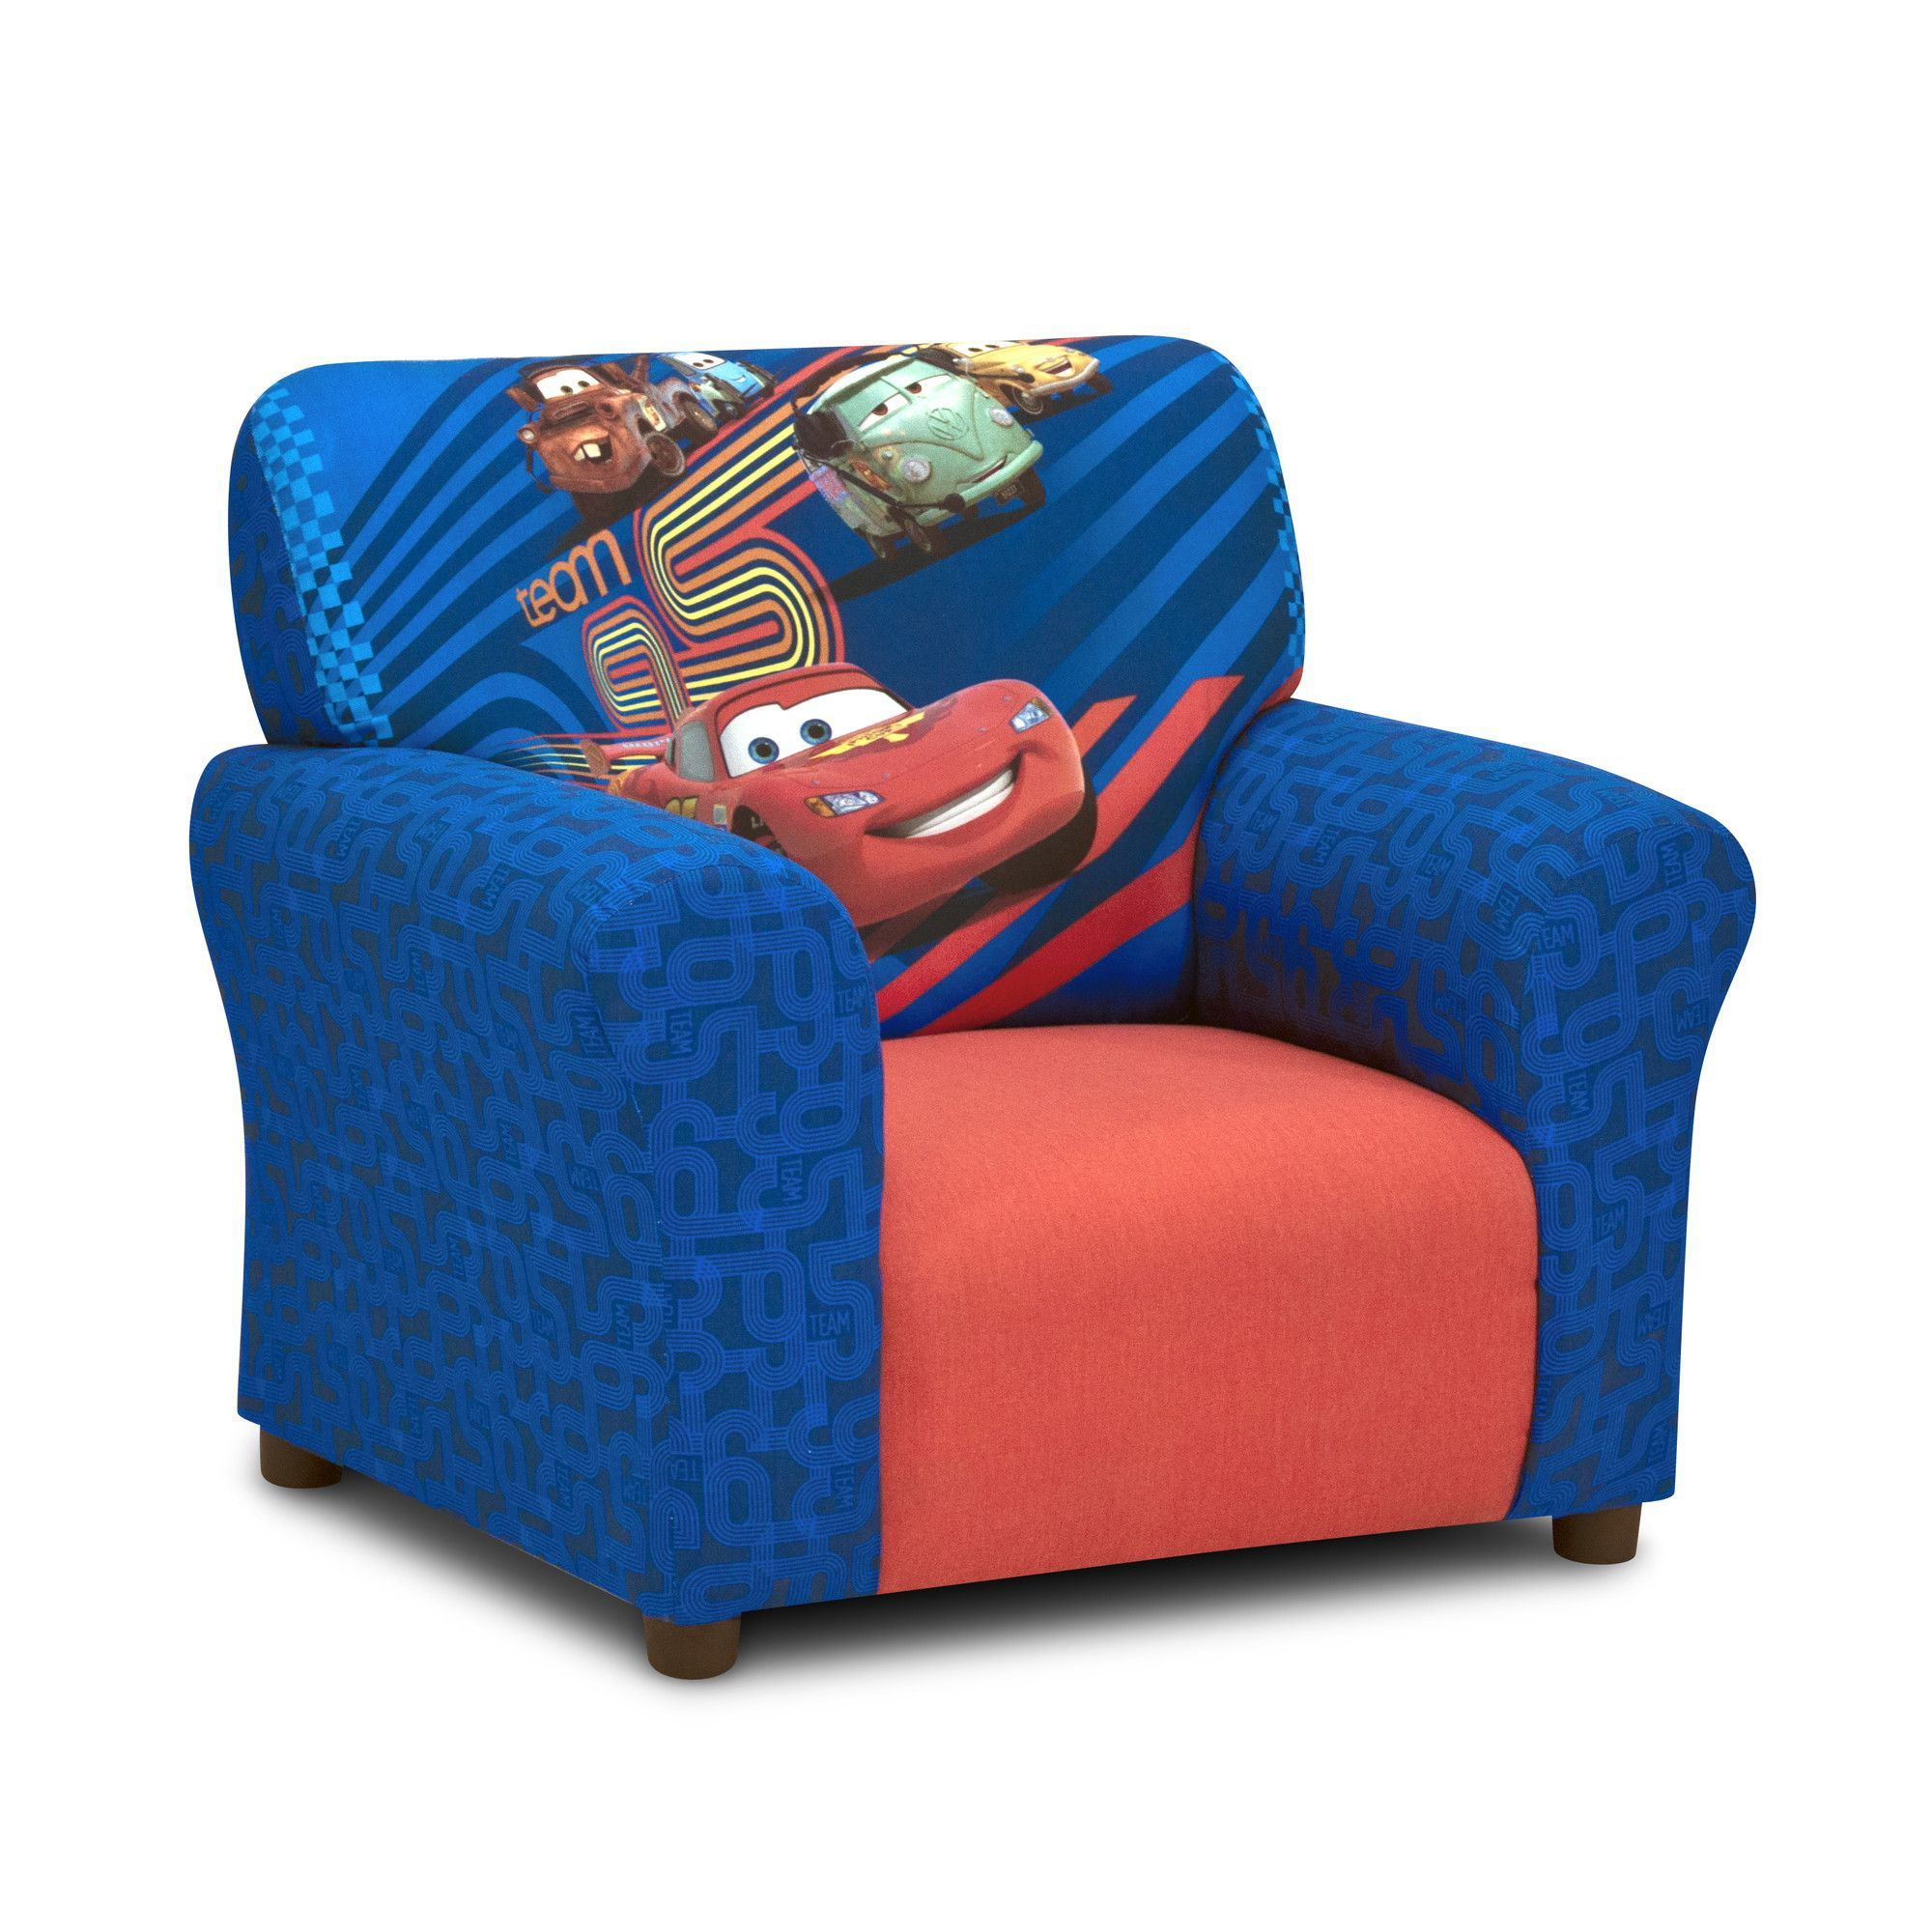 Pleasing Disneys Cars 2 Kids Club Chair Products Modern Kids Creativecarmelina Interior Chair Design Creativecarmelinacom